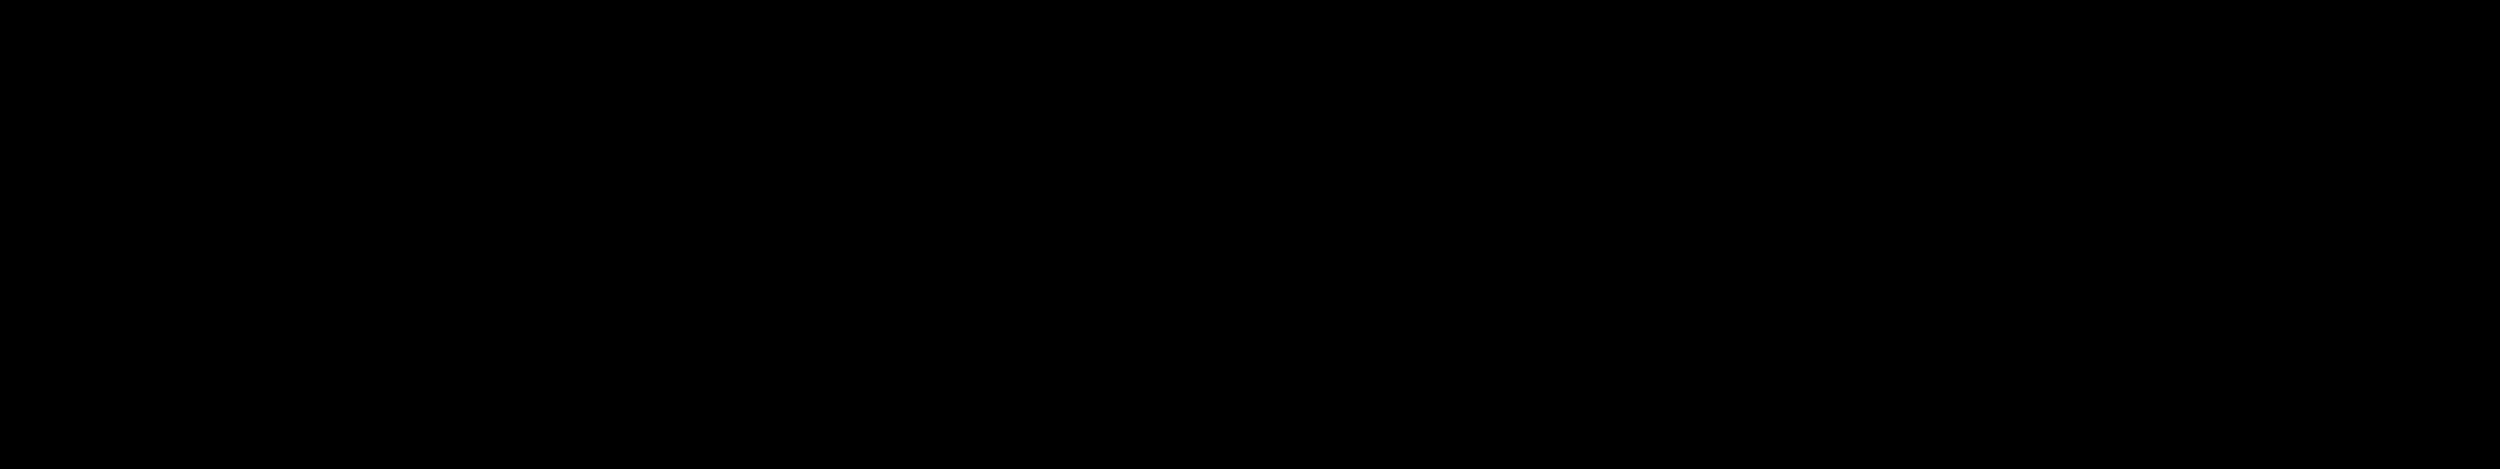 ms_logo-full.png